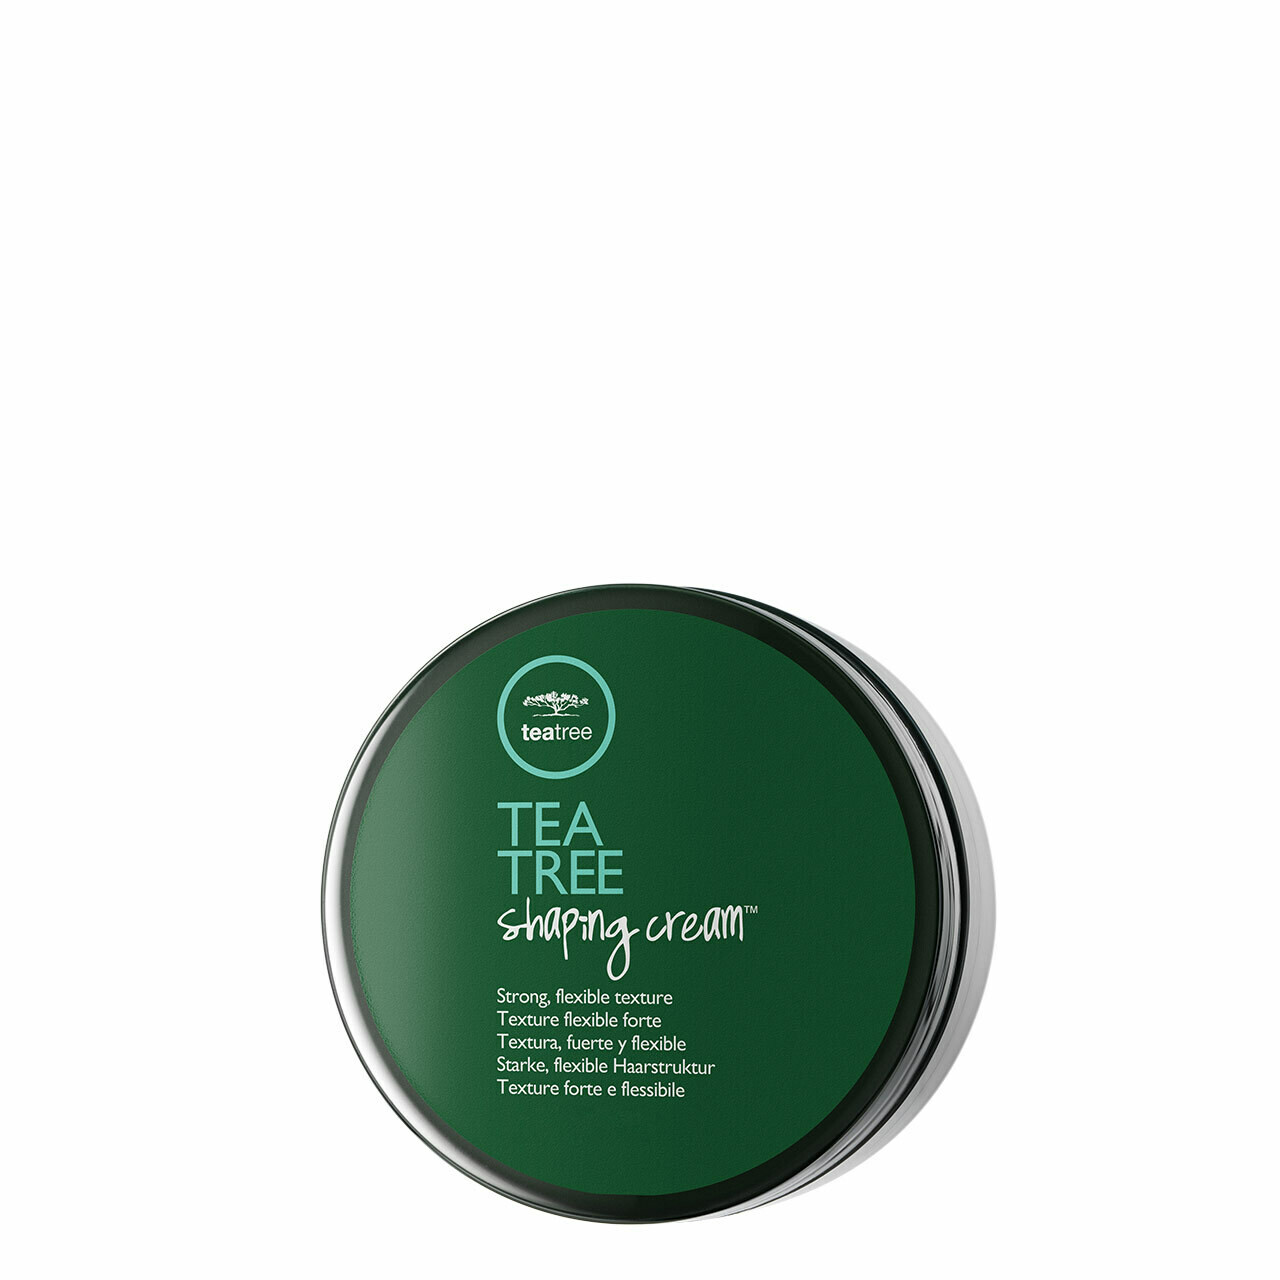 Tea Tree Shaping Cream 85gm